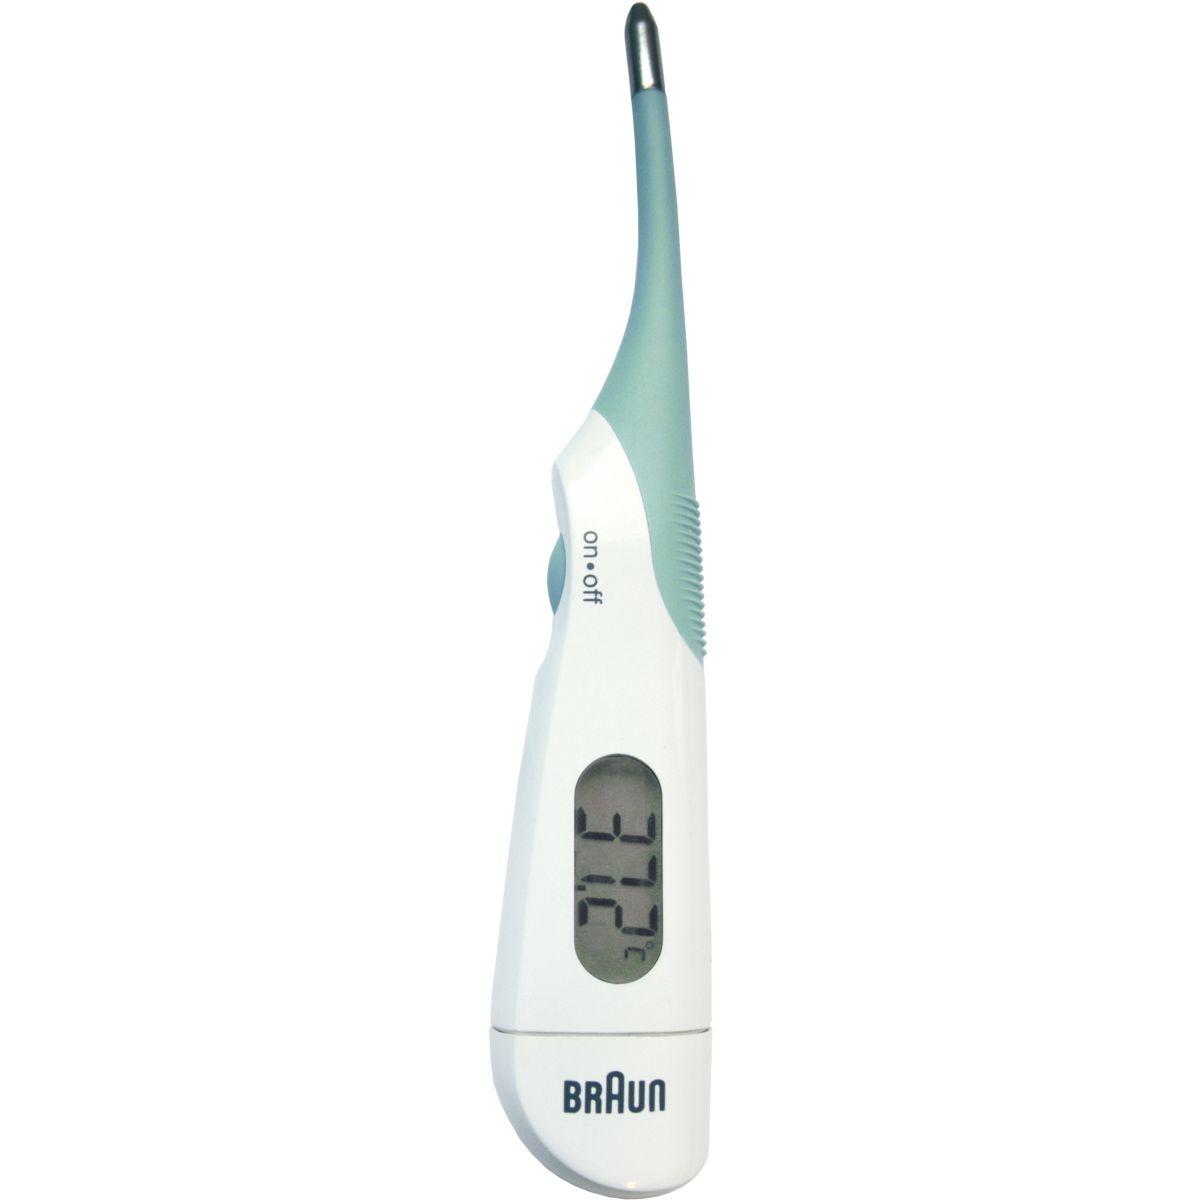 Thermomètre BRAUN PRT1000 Digital High S